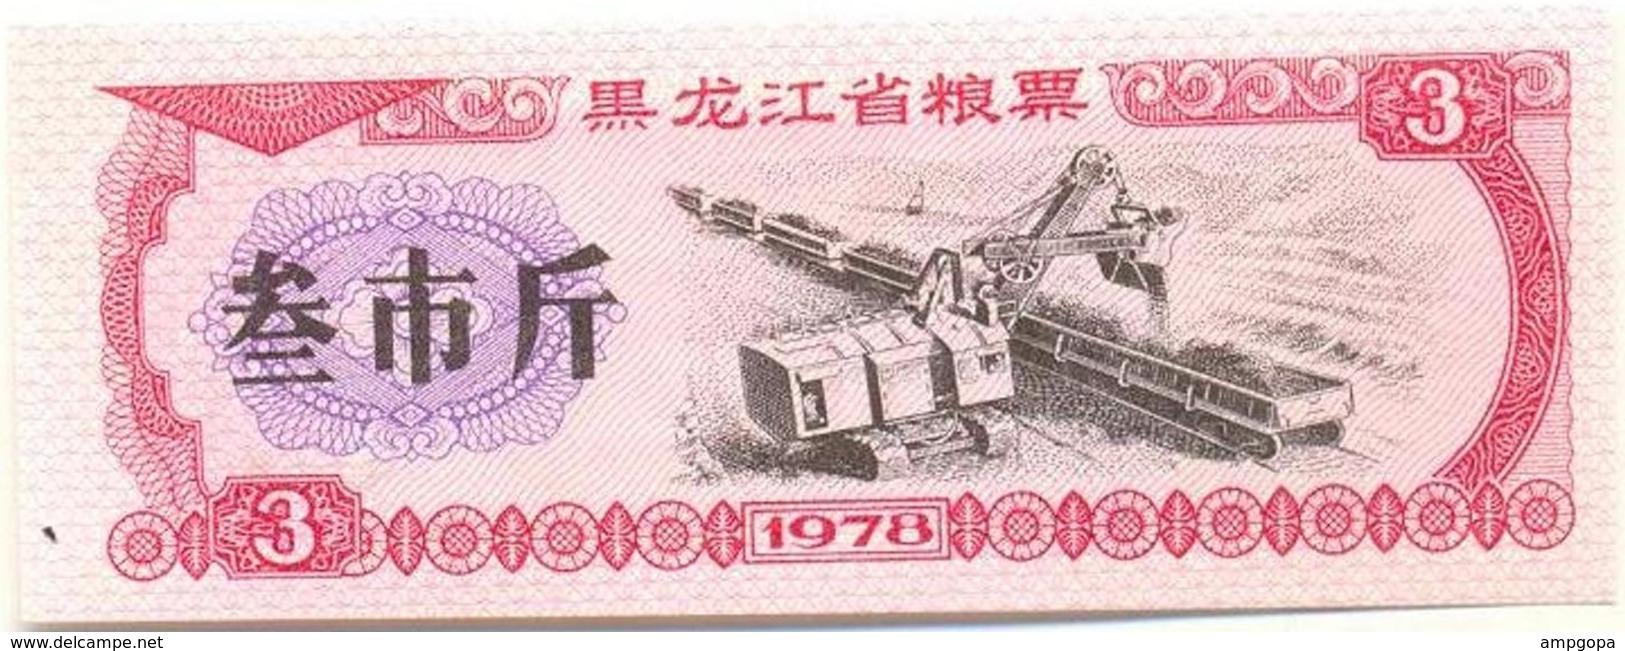 China (CUPONES) 3 Kilos 1978 Heilongjiang Cn 23 3000 UNC - China